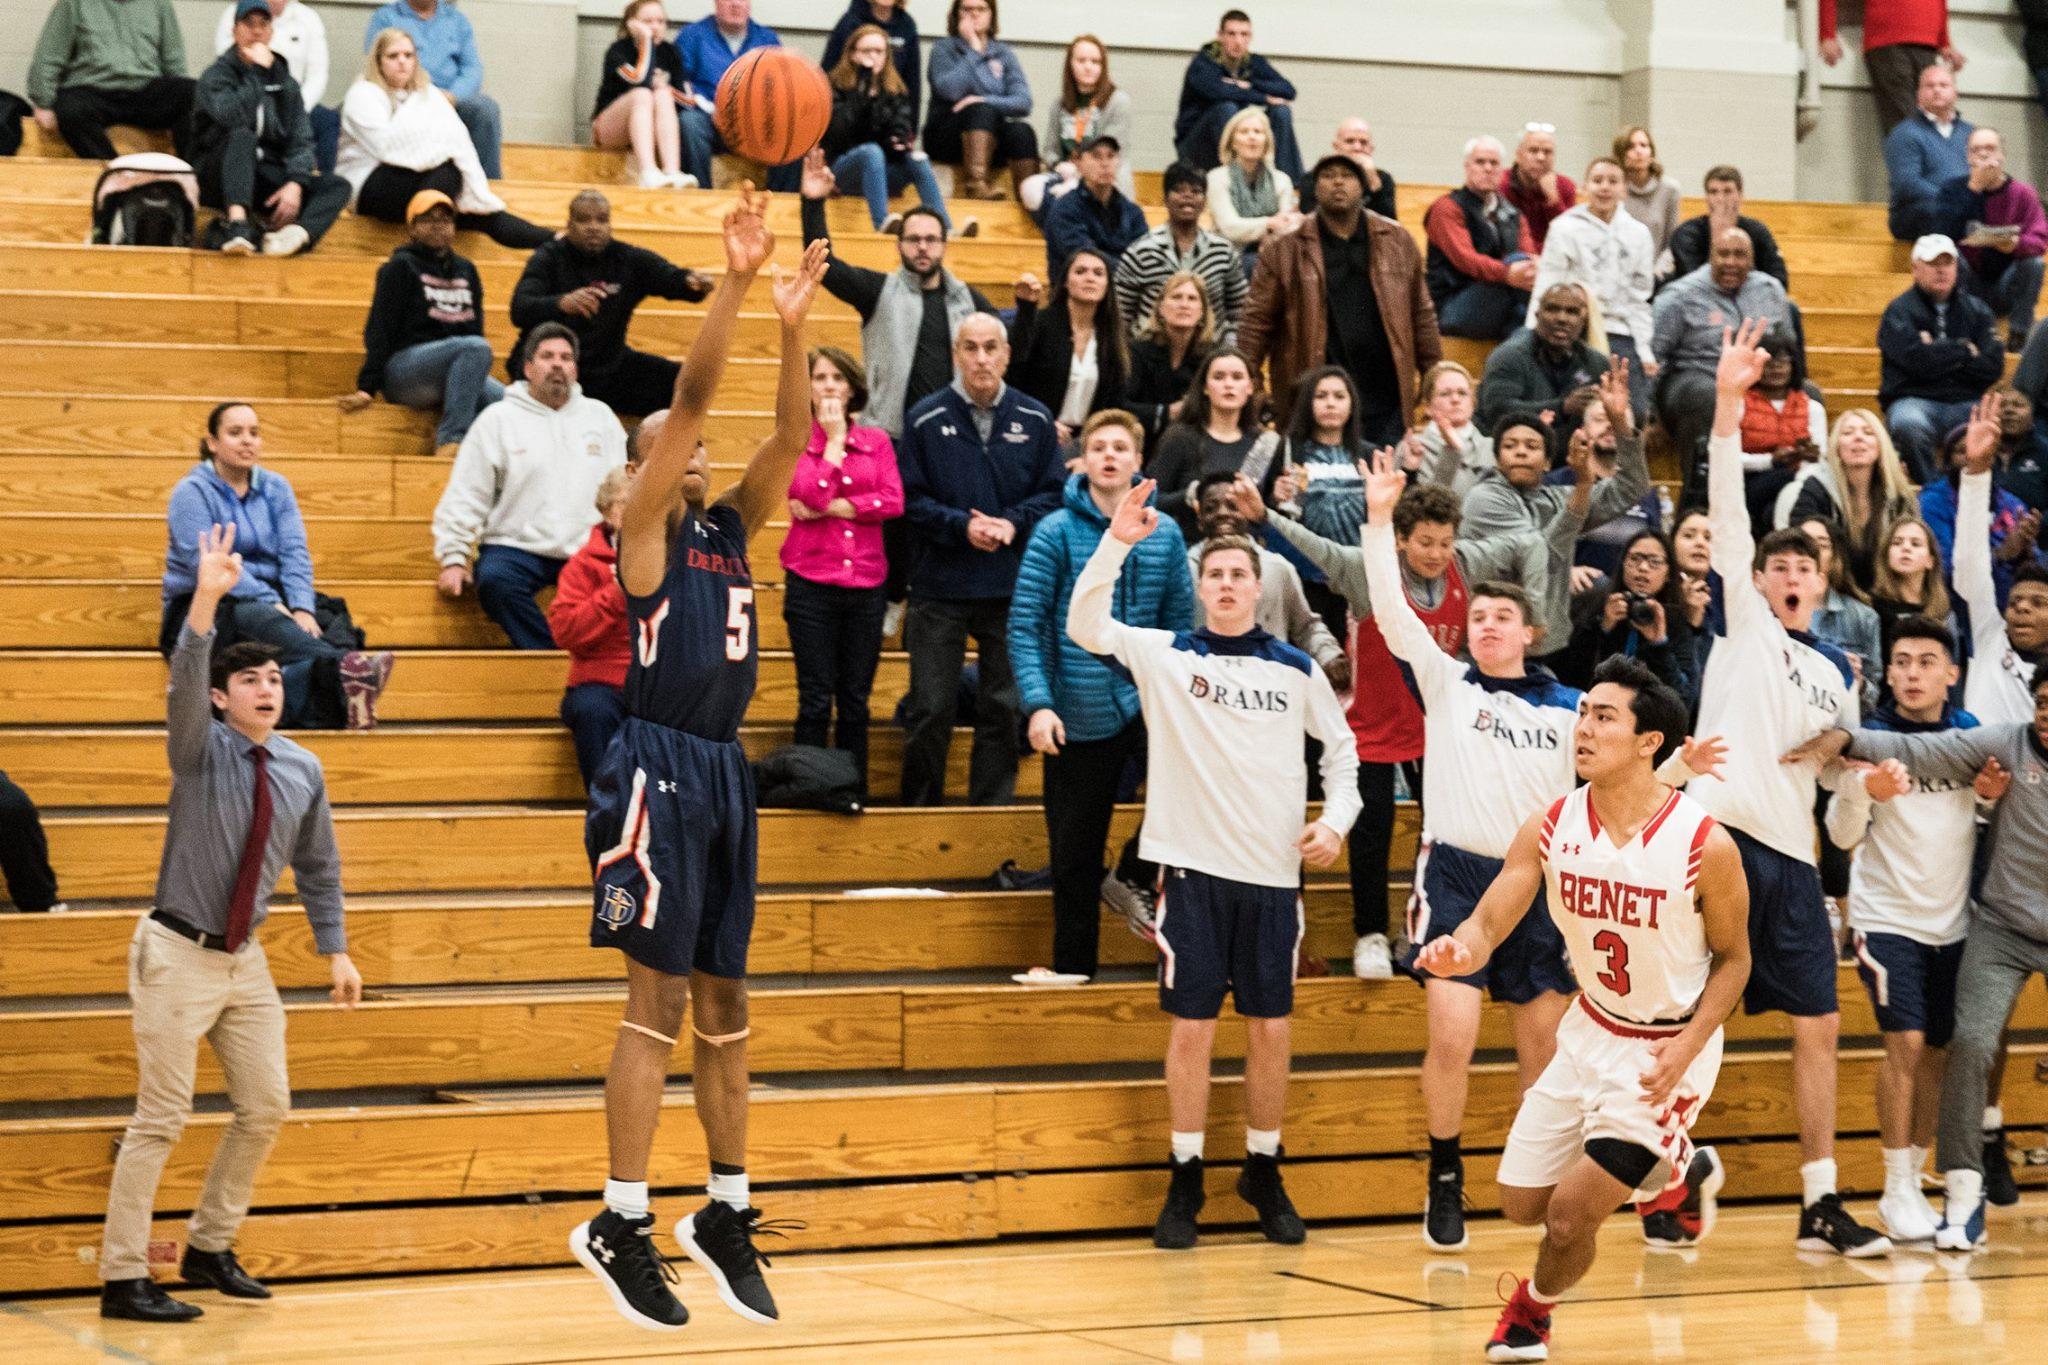 boys basketball - depaul college prep